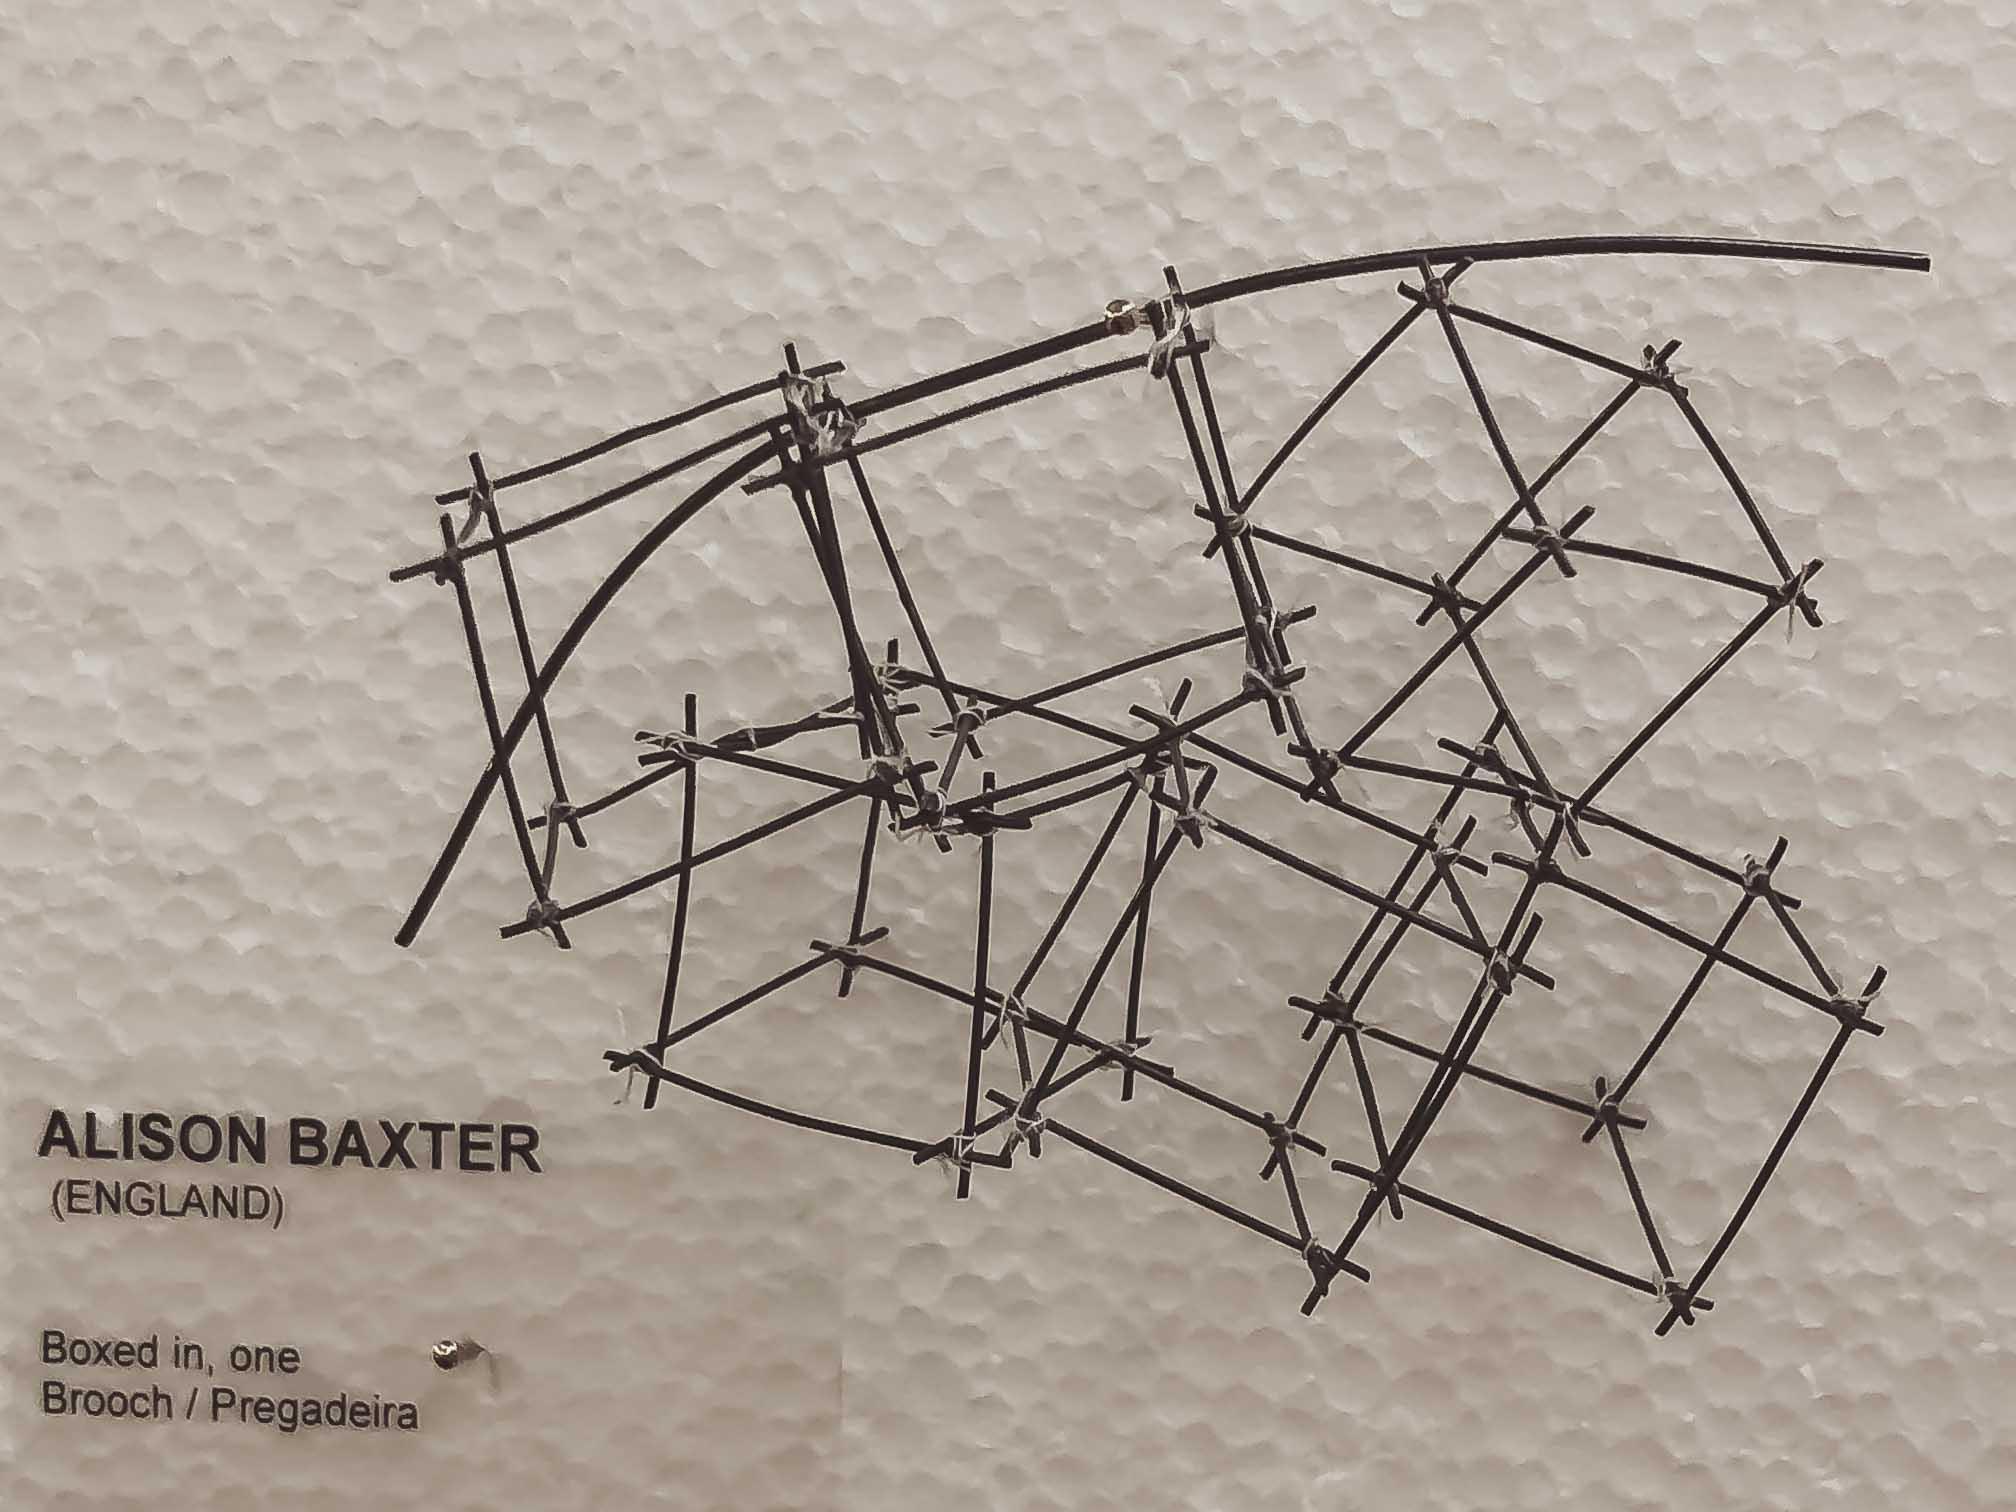 Alison Baxter - England